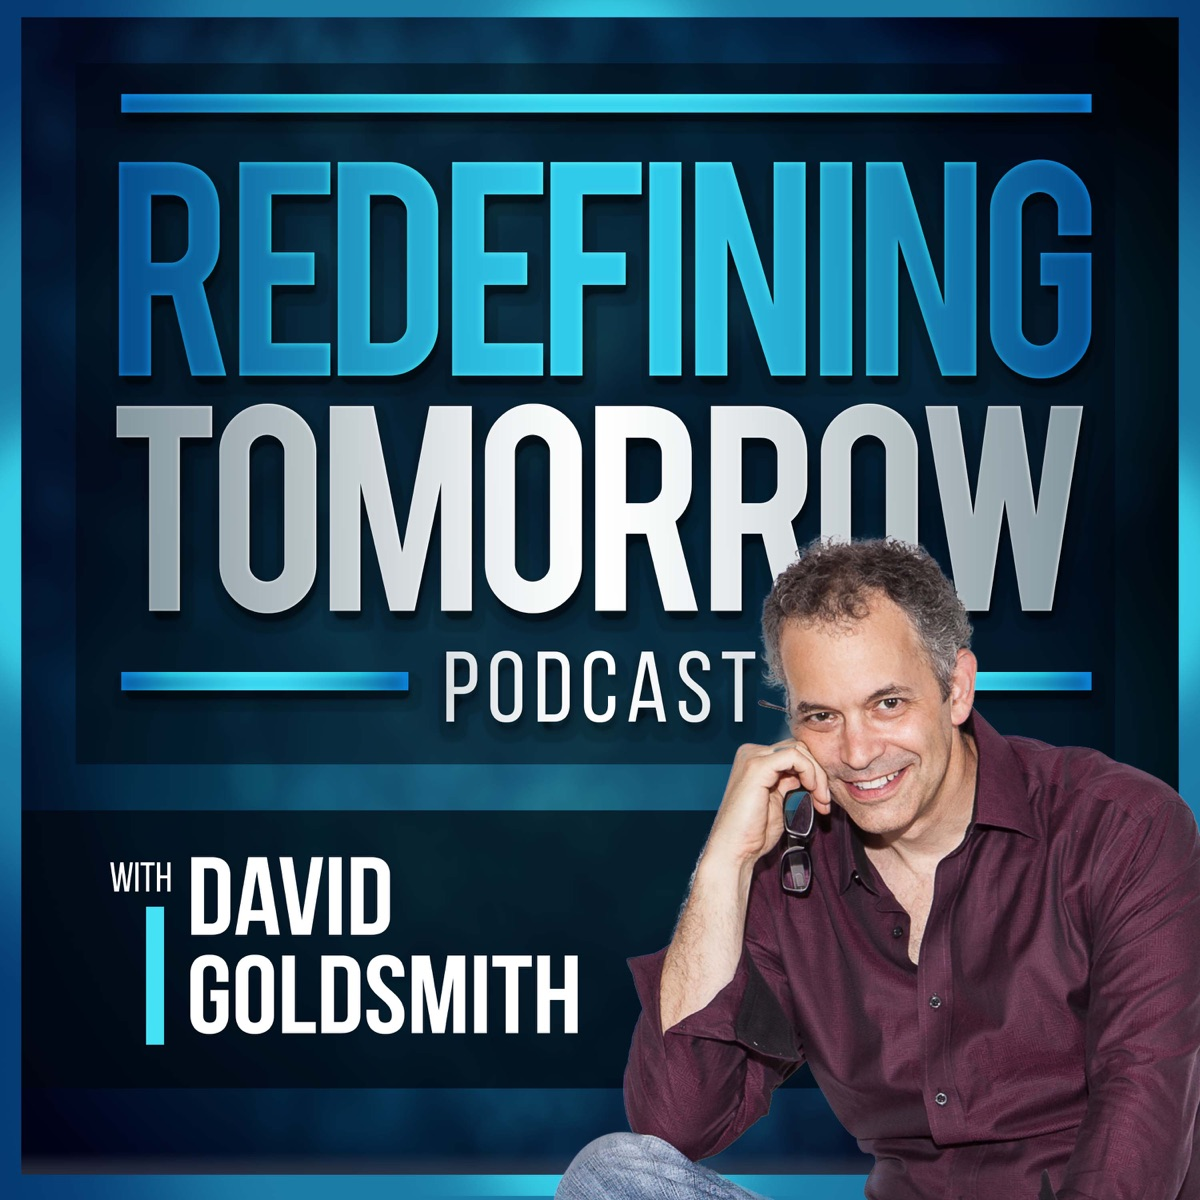 Redefining Tomorrow with David Goldsmith